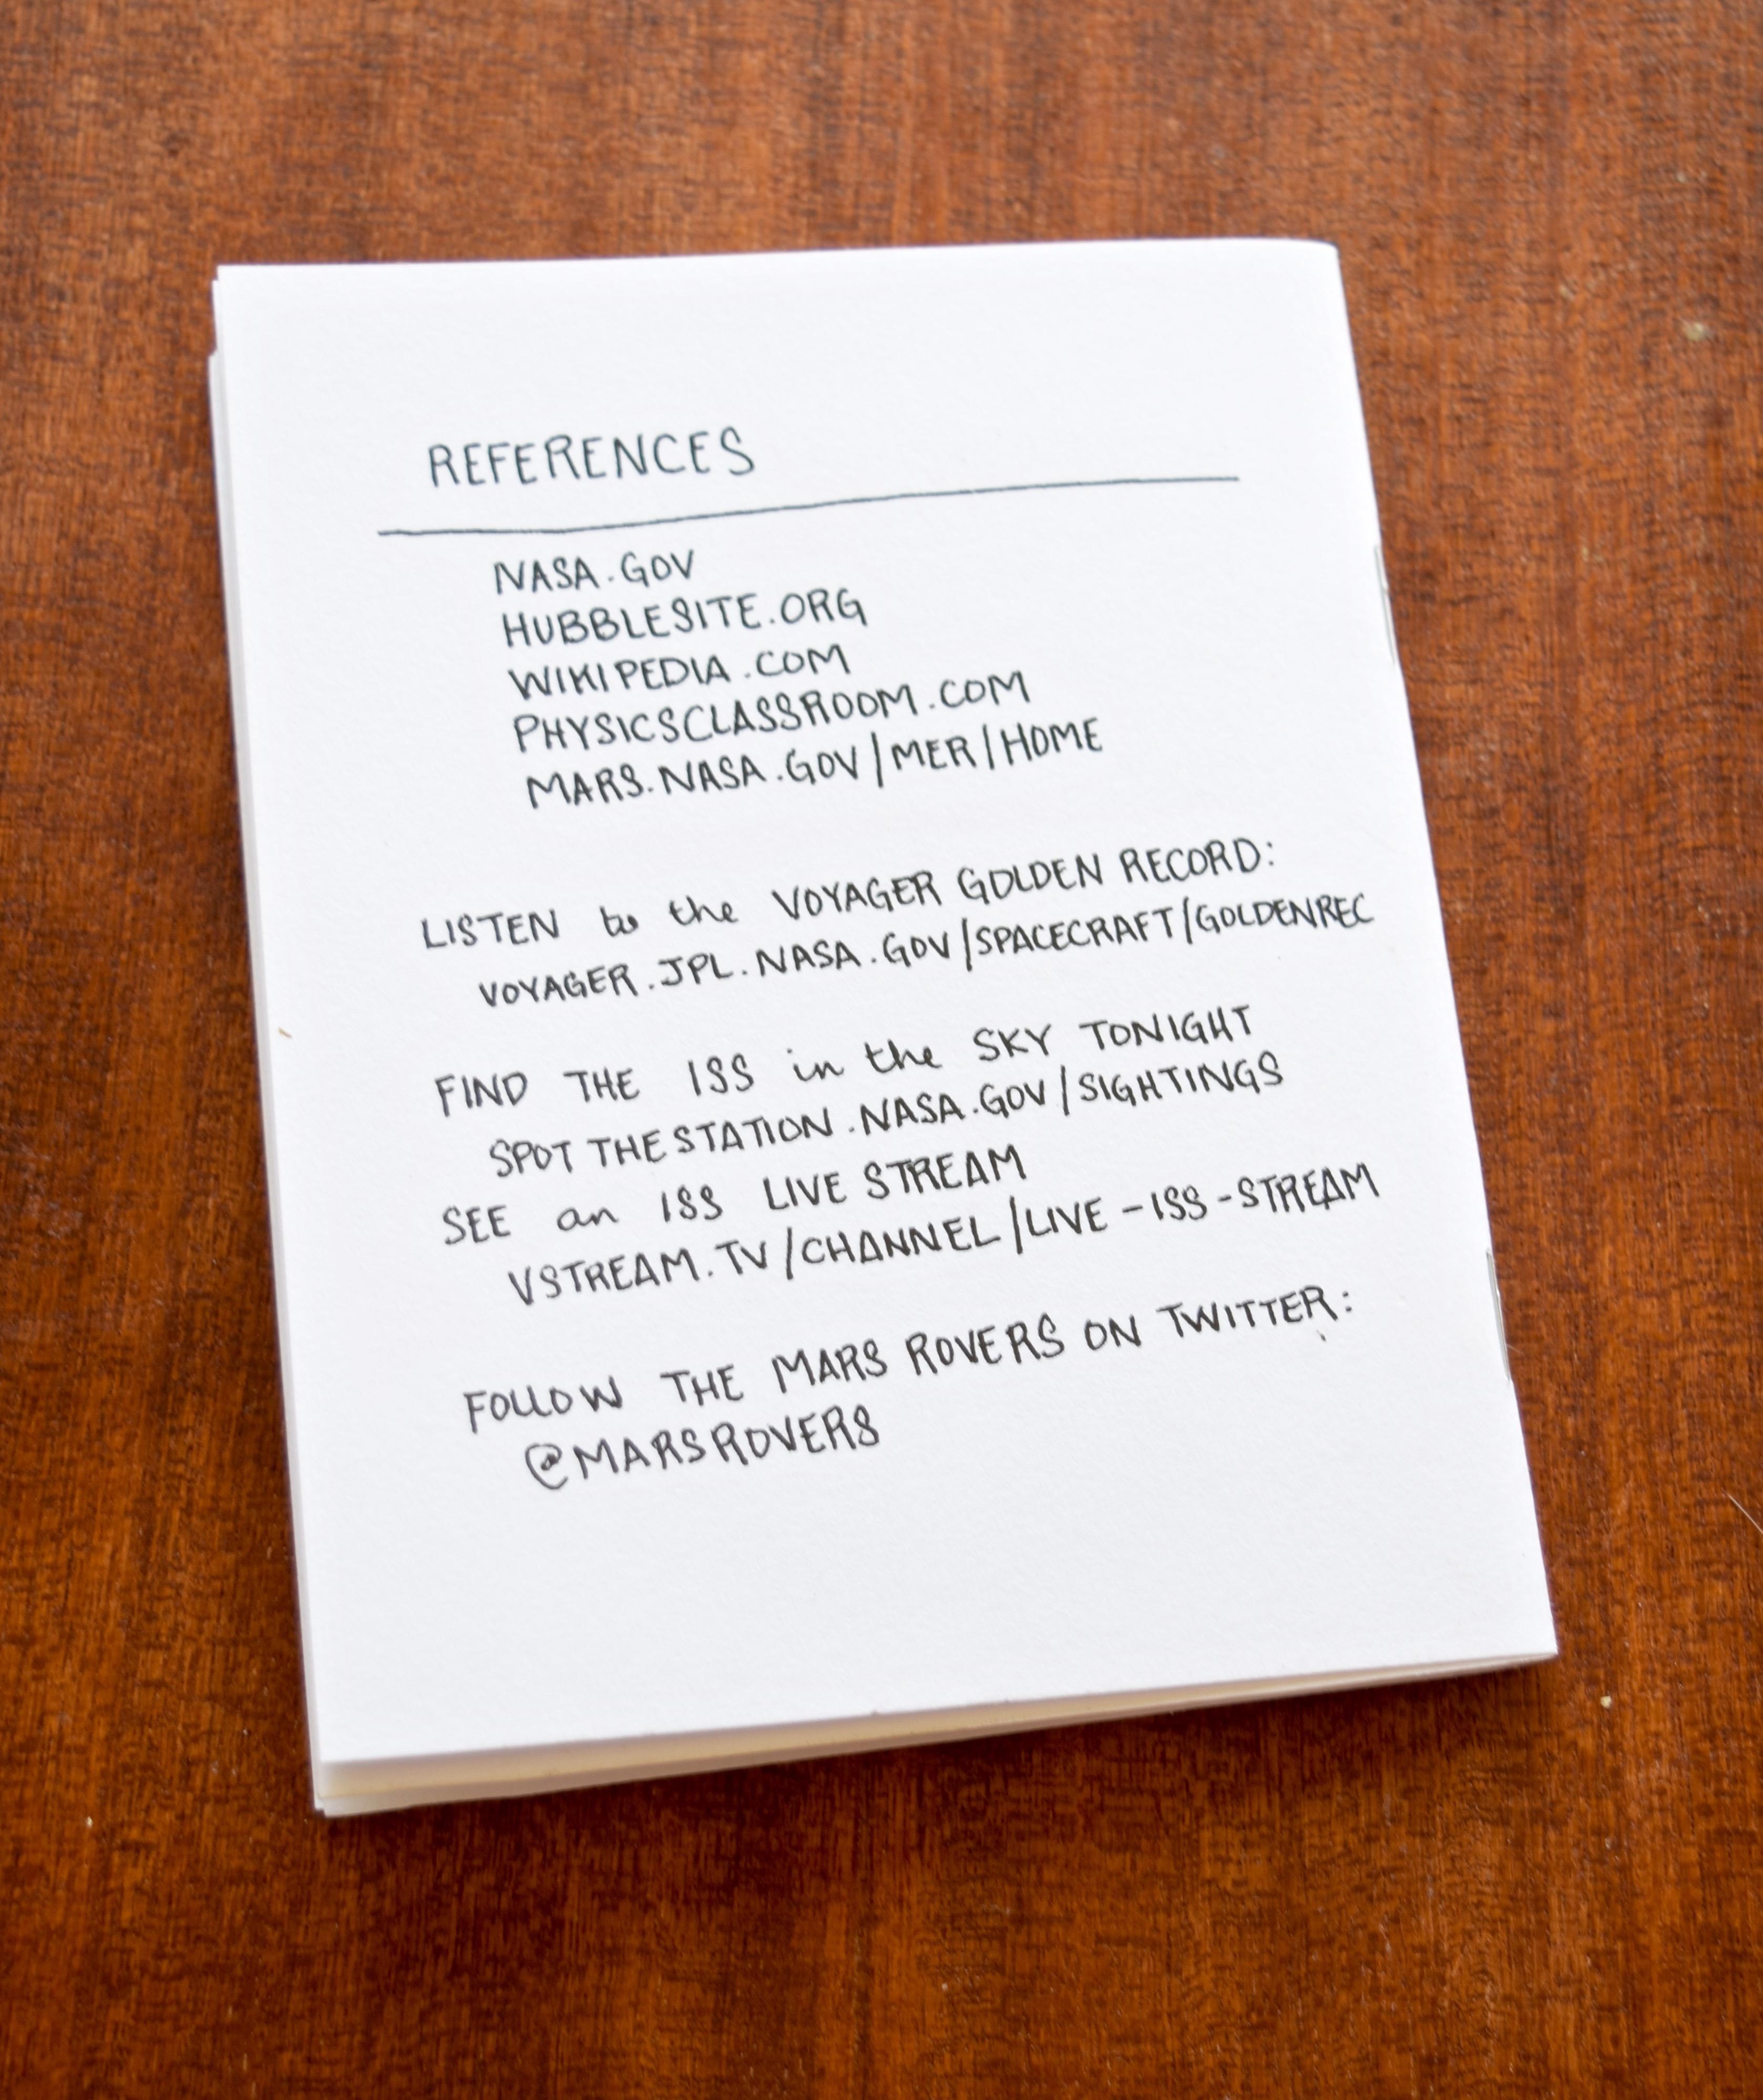 PSSE - References